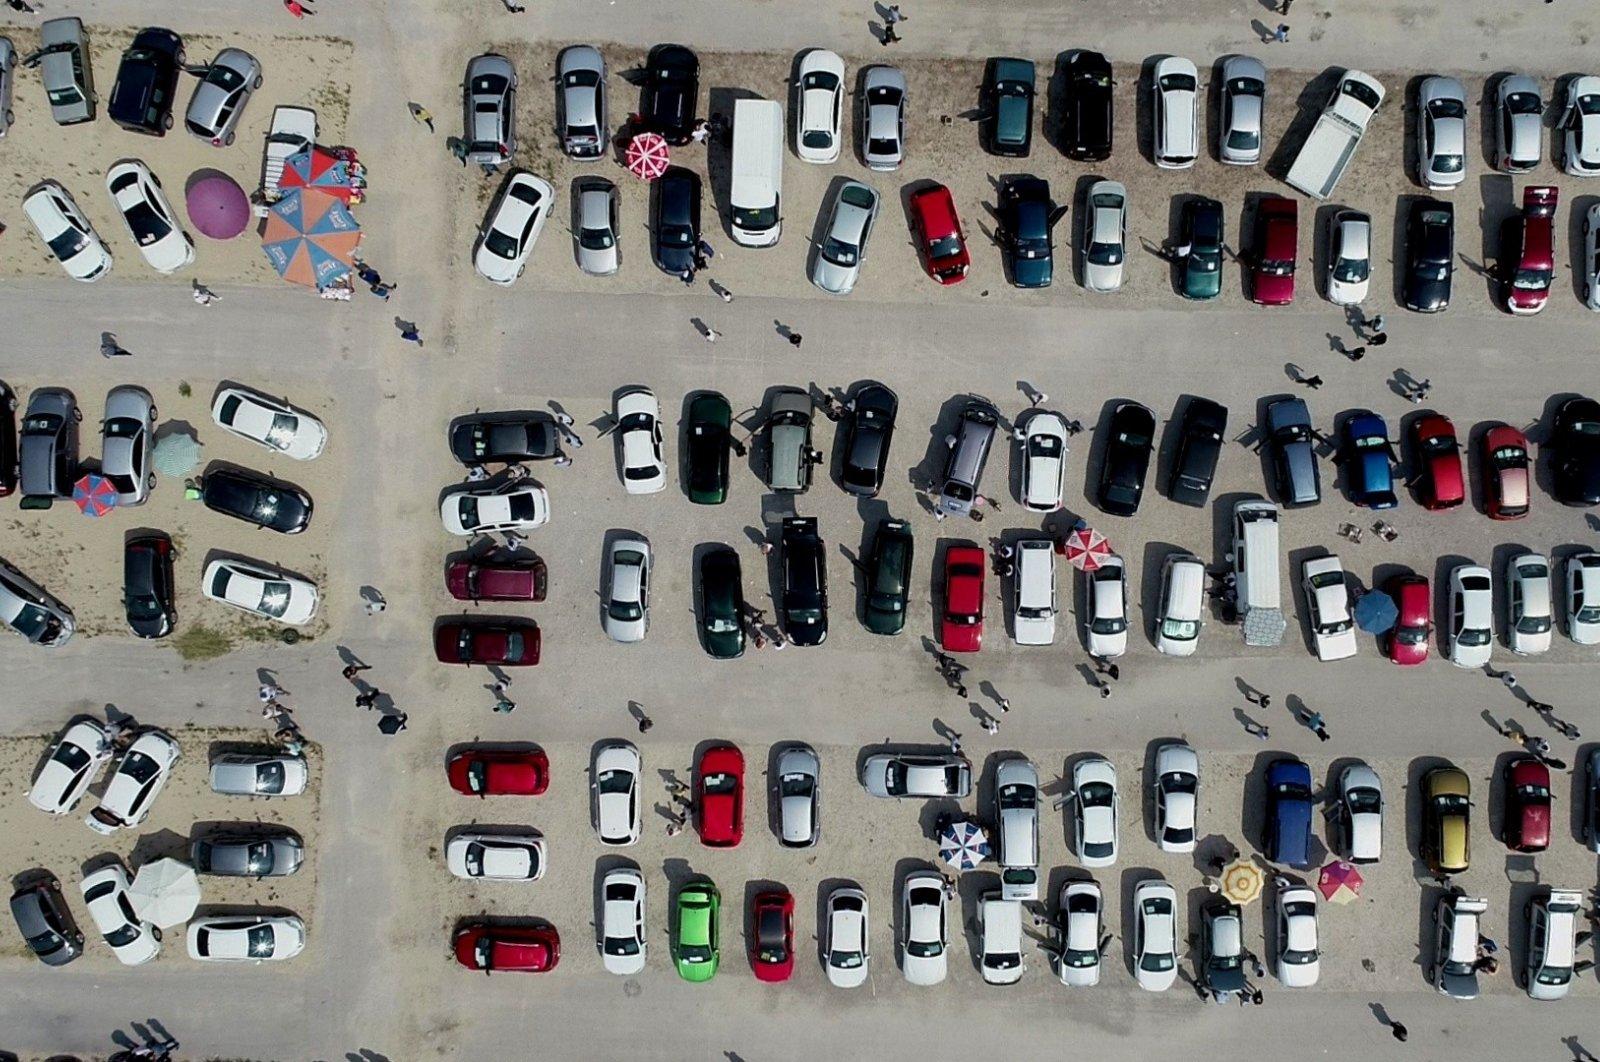 Used cars fill a secondhand auto market in northwestern Bursa province, Turkey, July 26, 2020. (IHA Photo)